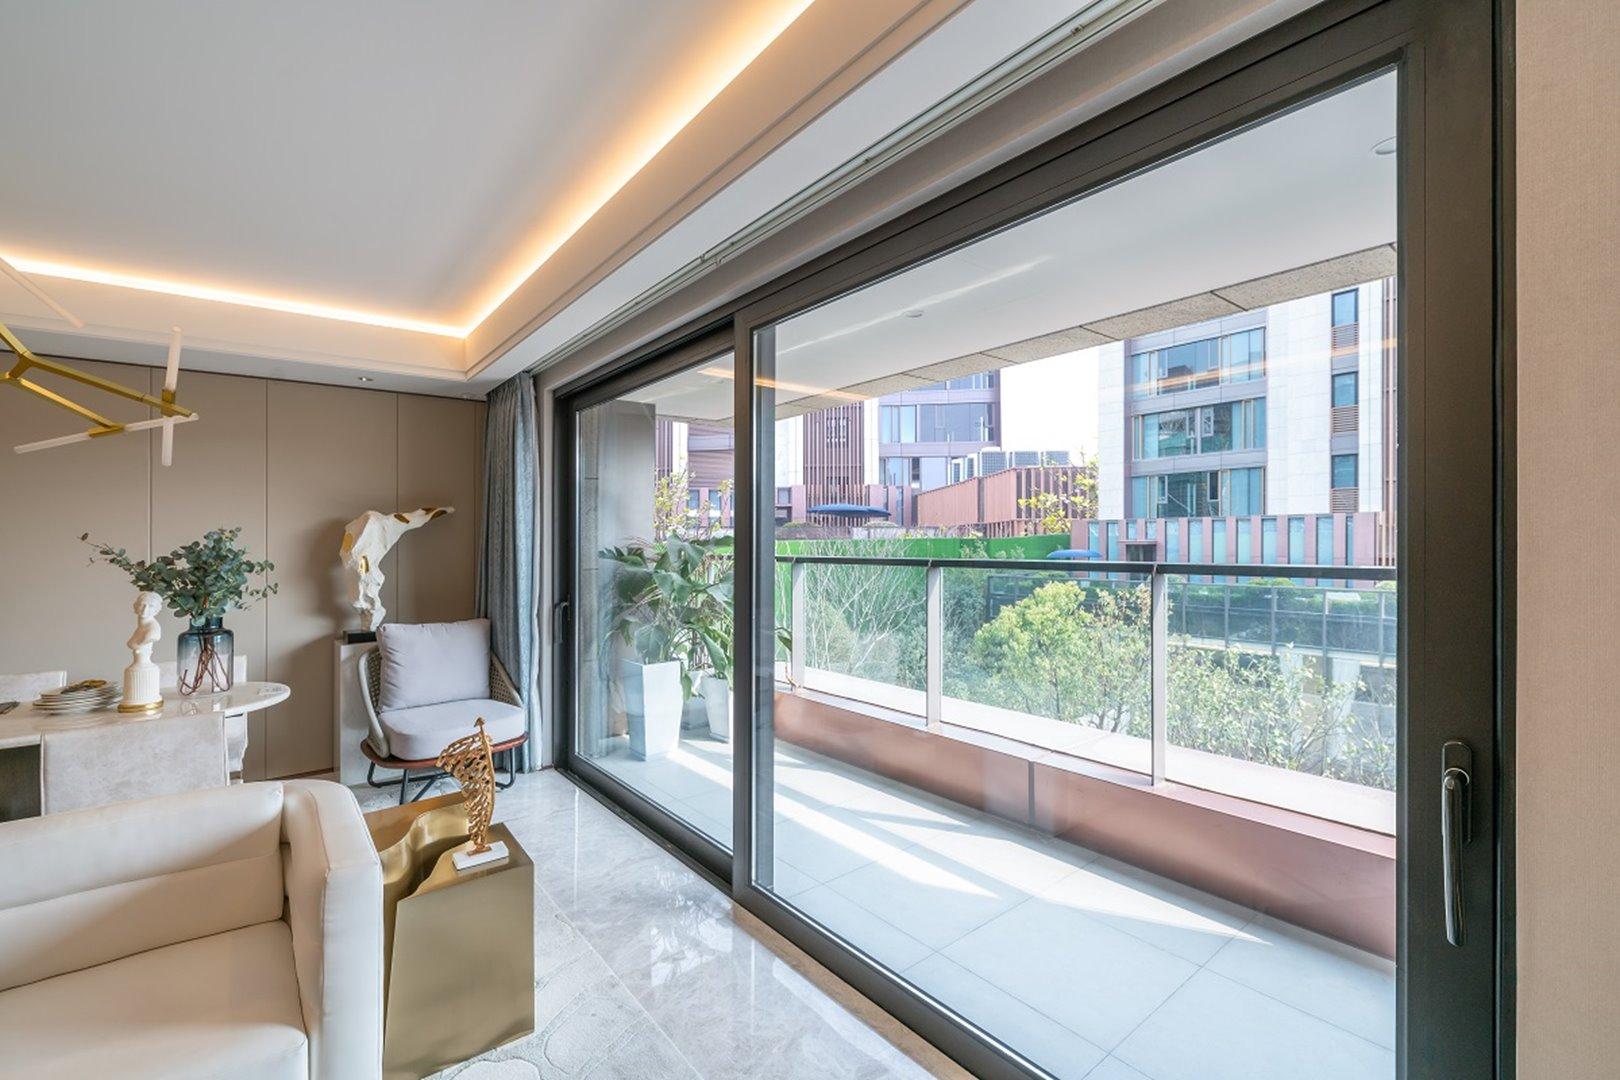 living room view with sliding door